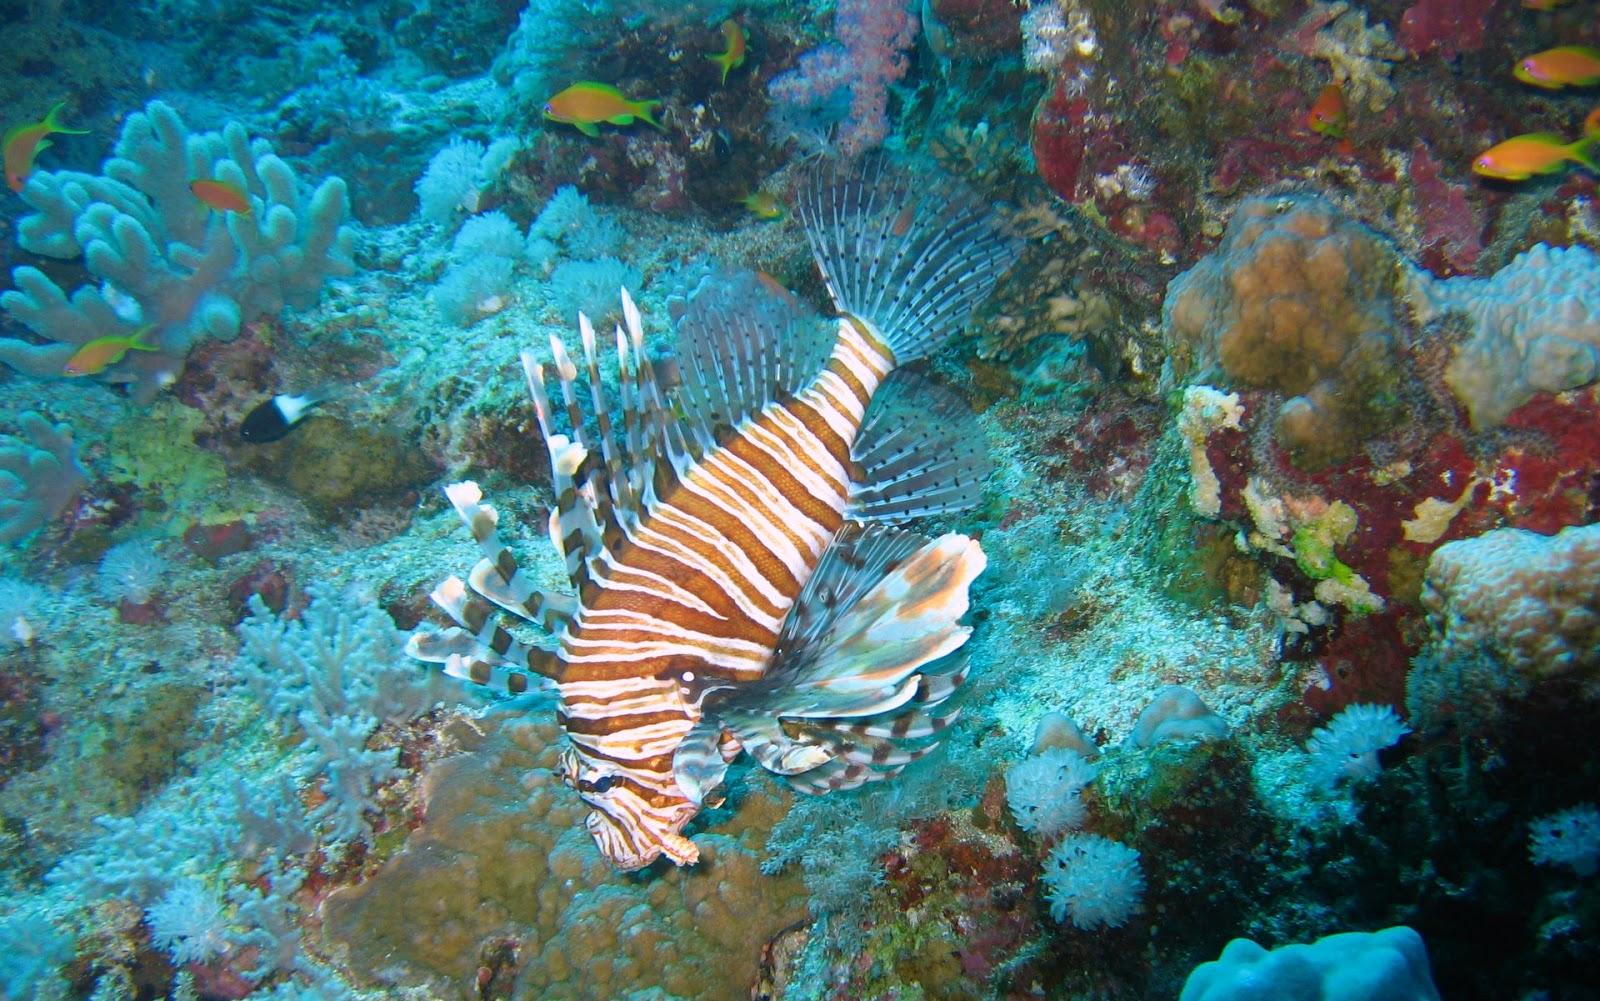 http://4.bp.blogspot.com/-b2LmXnqx8CU/UKucifOitRI/AAAAAAAAIB8/thkIwMpksN8/s1600/lion-fish-underwater-ocean-wallpaper-1920x1200-elphstone+reef+017.jpg